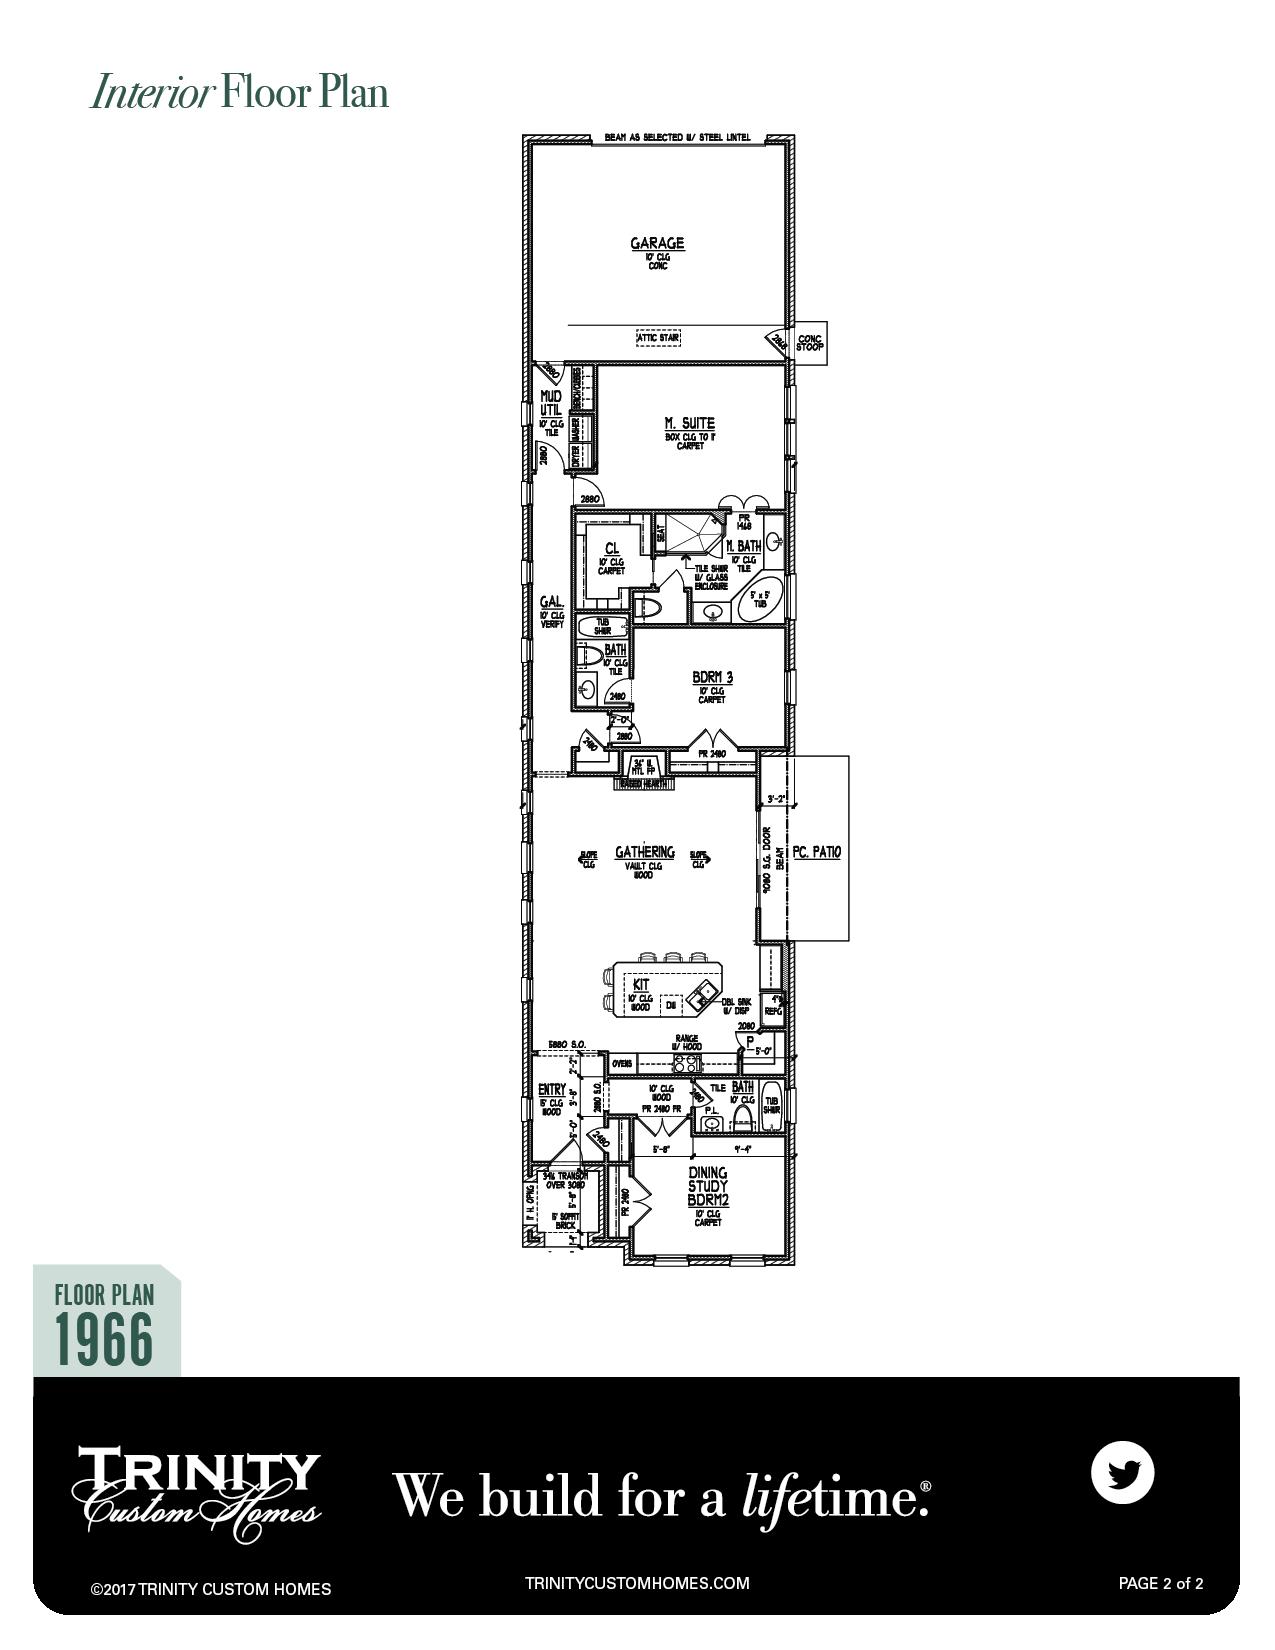 ShowcaseFlyerFloorPlan1966-02